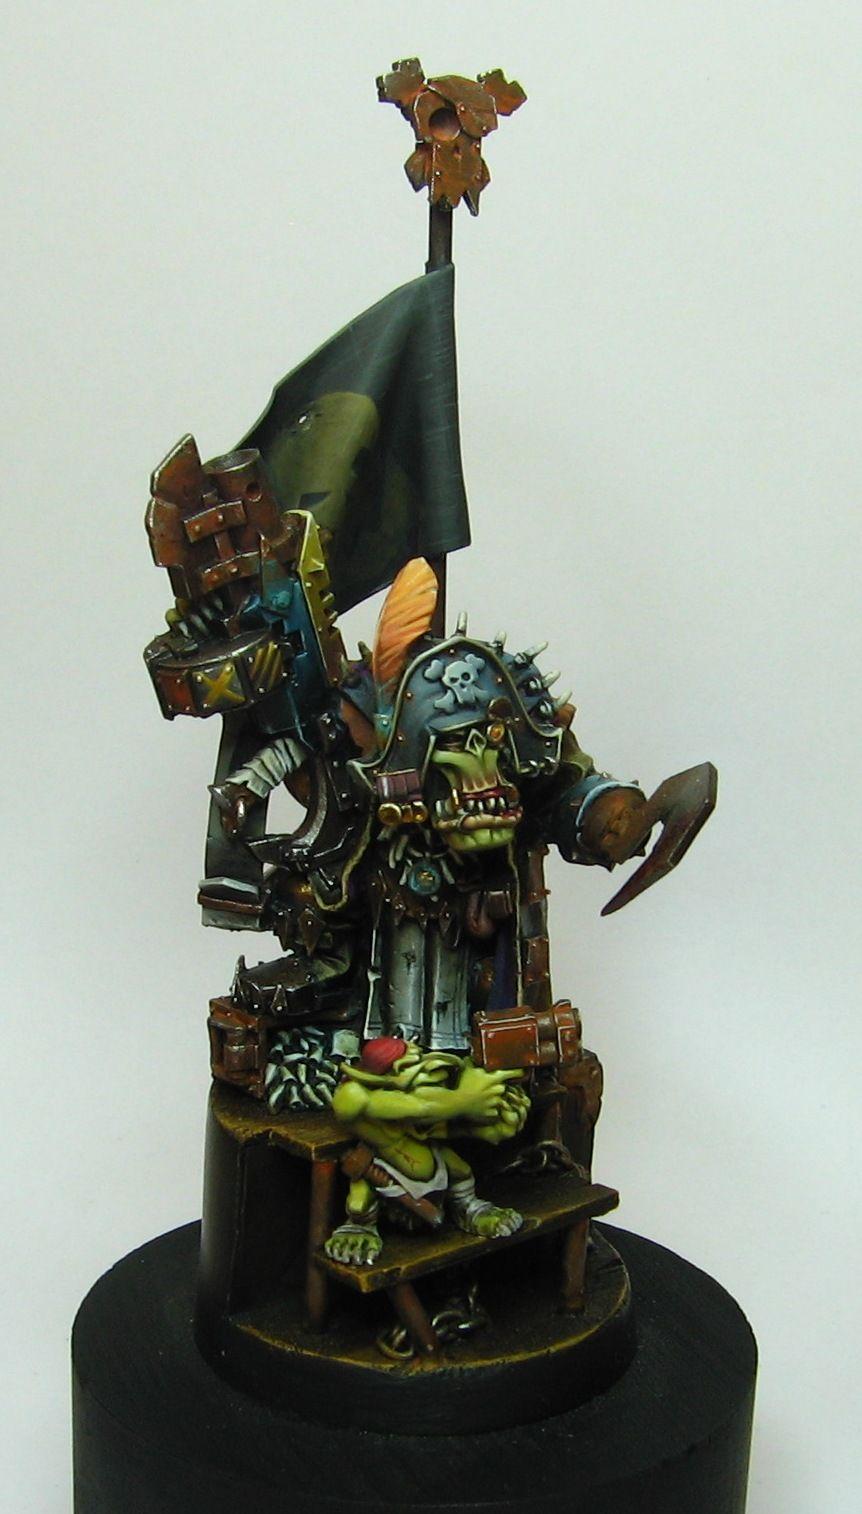 Ork pirate - 40k | Warhammer 40k - Orks | Pirates, Warhammer 40k miniatures, Miniatures